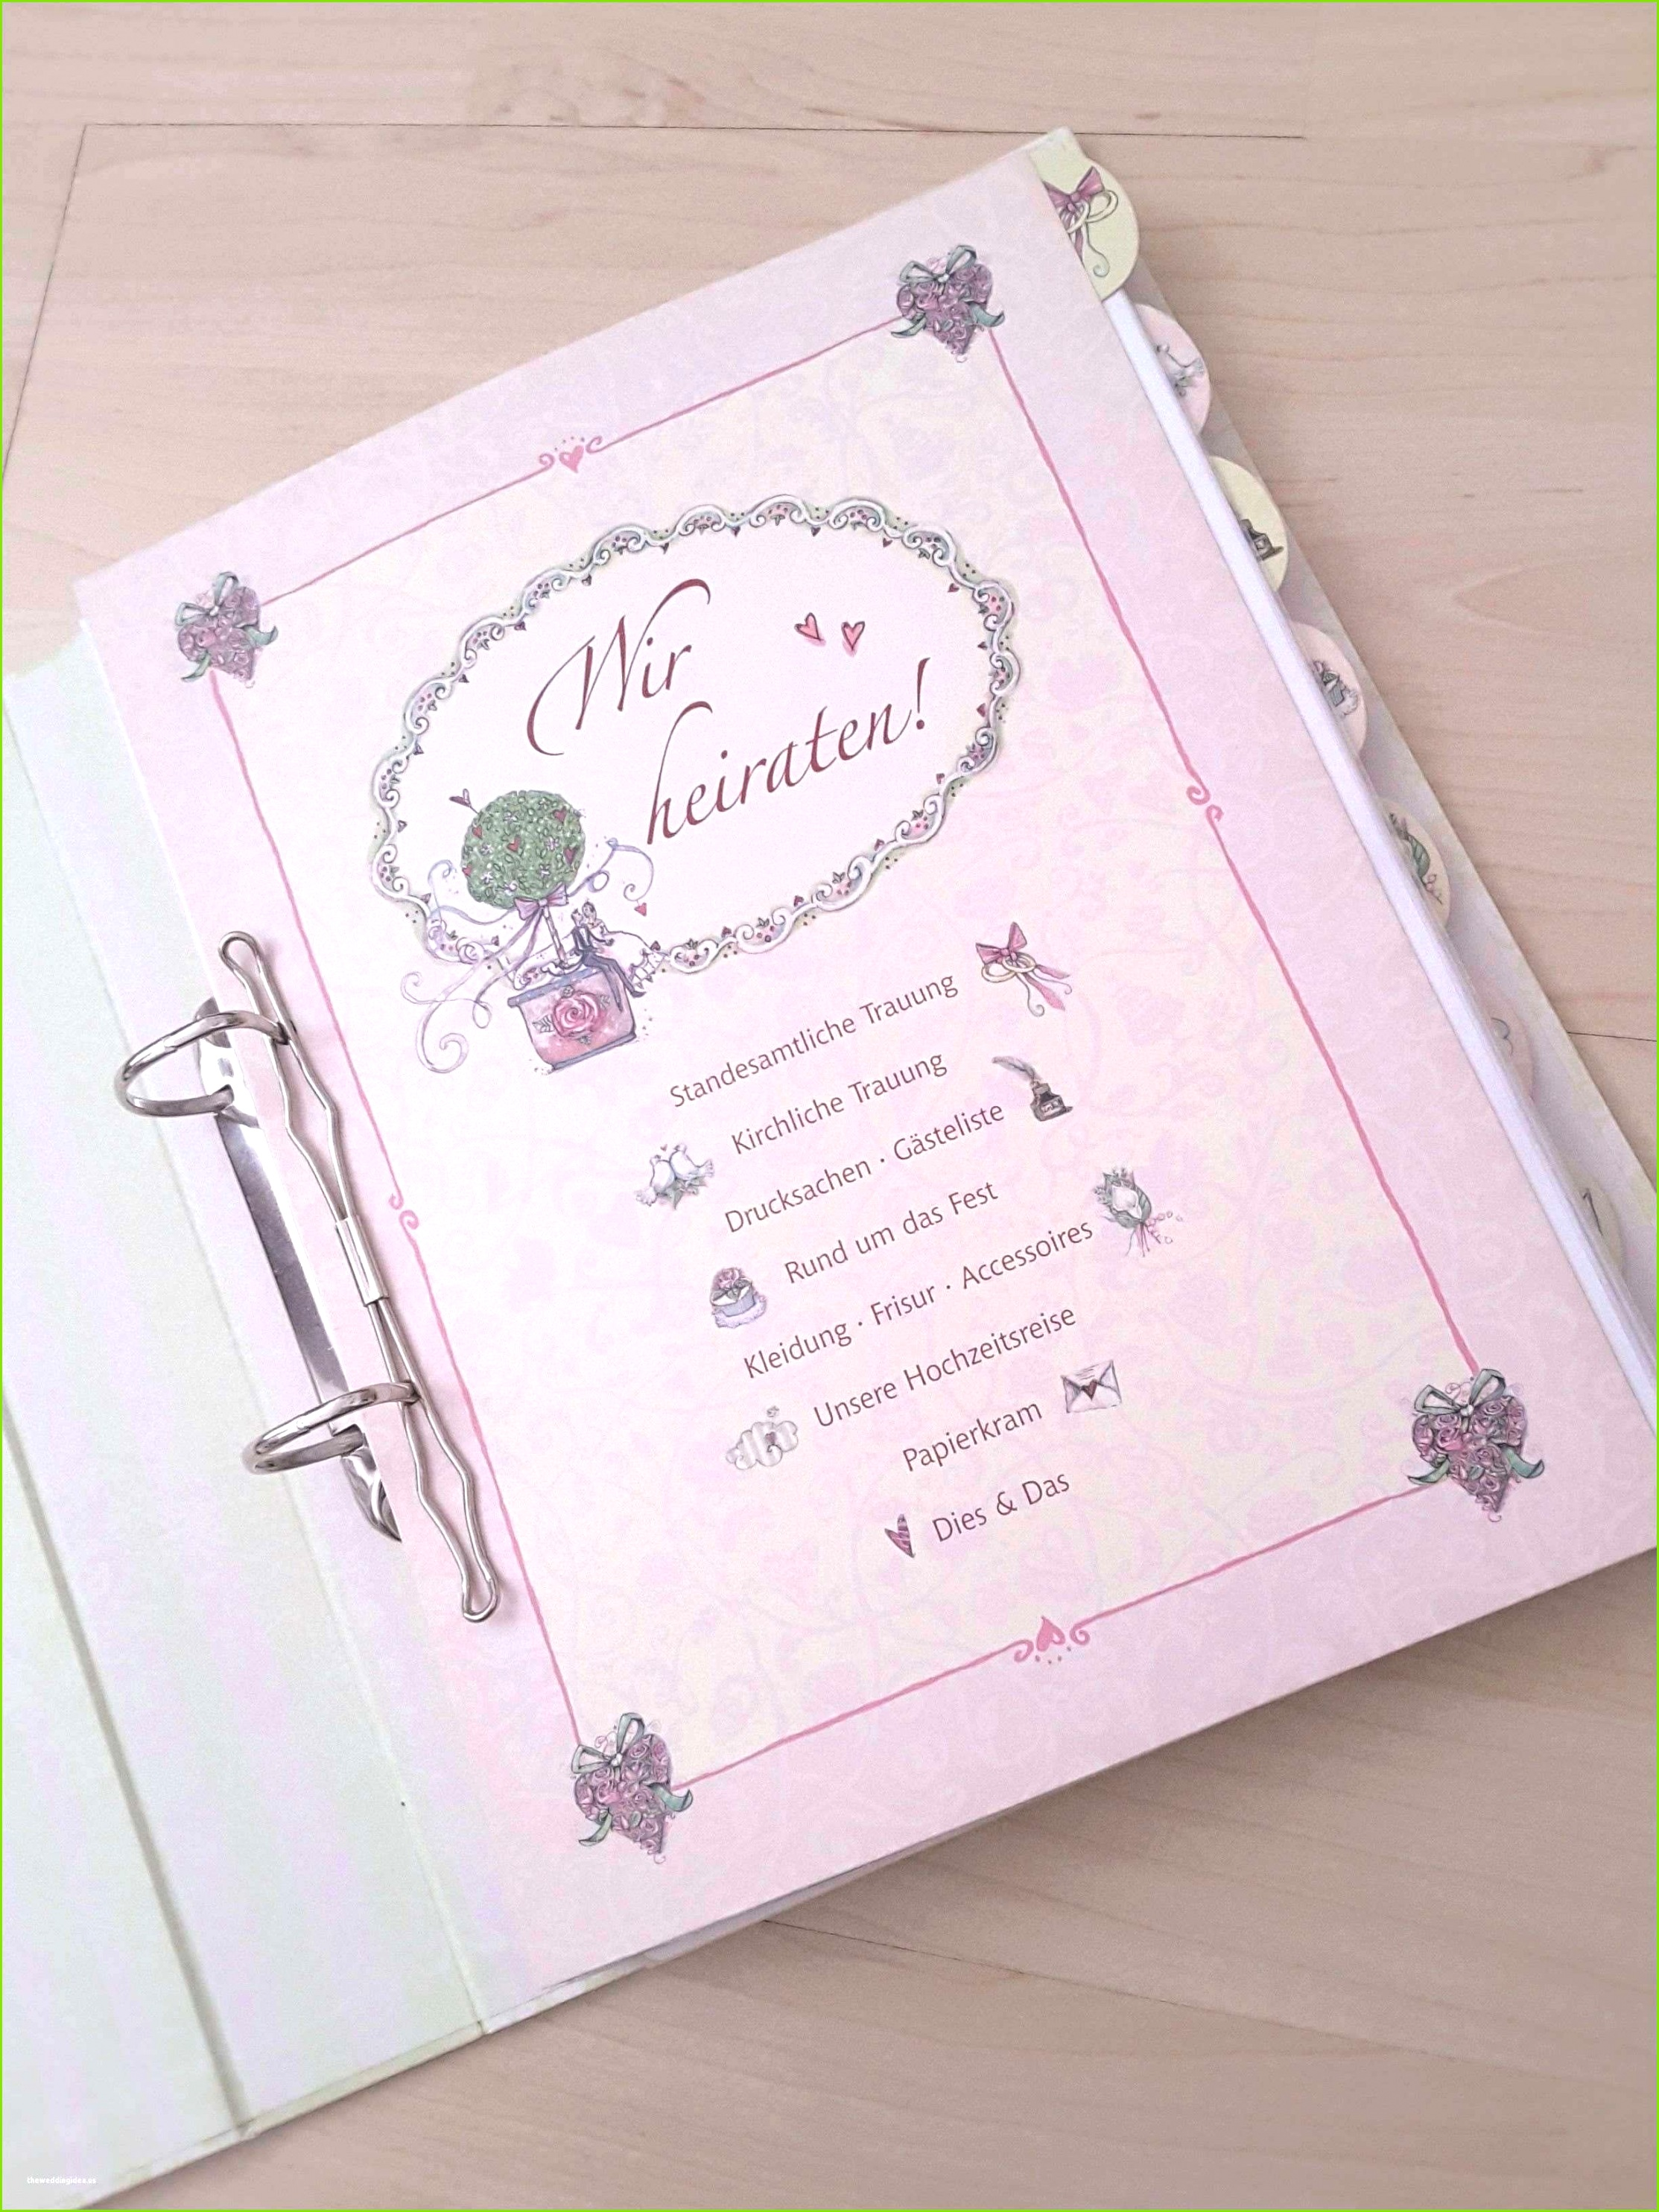 Anchor Paper Wedding Invitations Awesome Refreshing Wedding Invitations Rustic